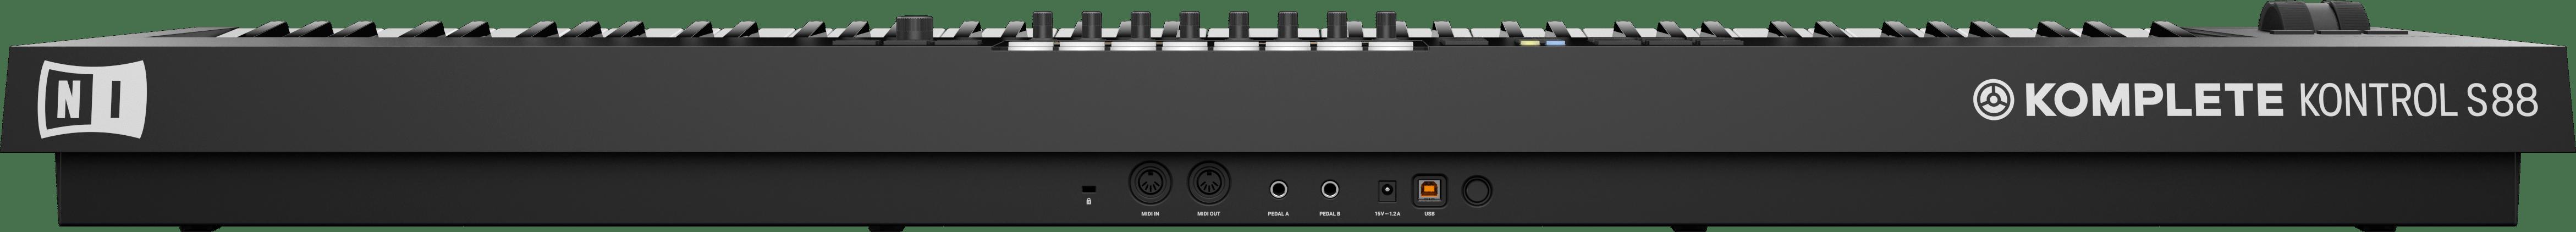 KOMPLETE KONTROL S88 MK2